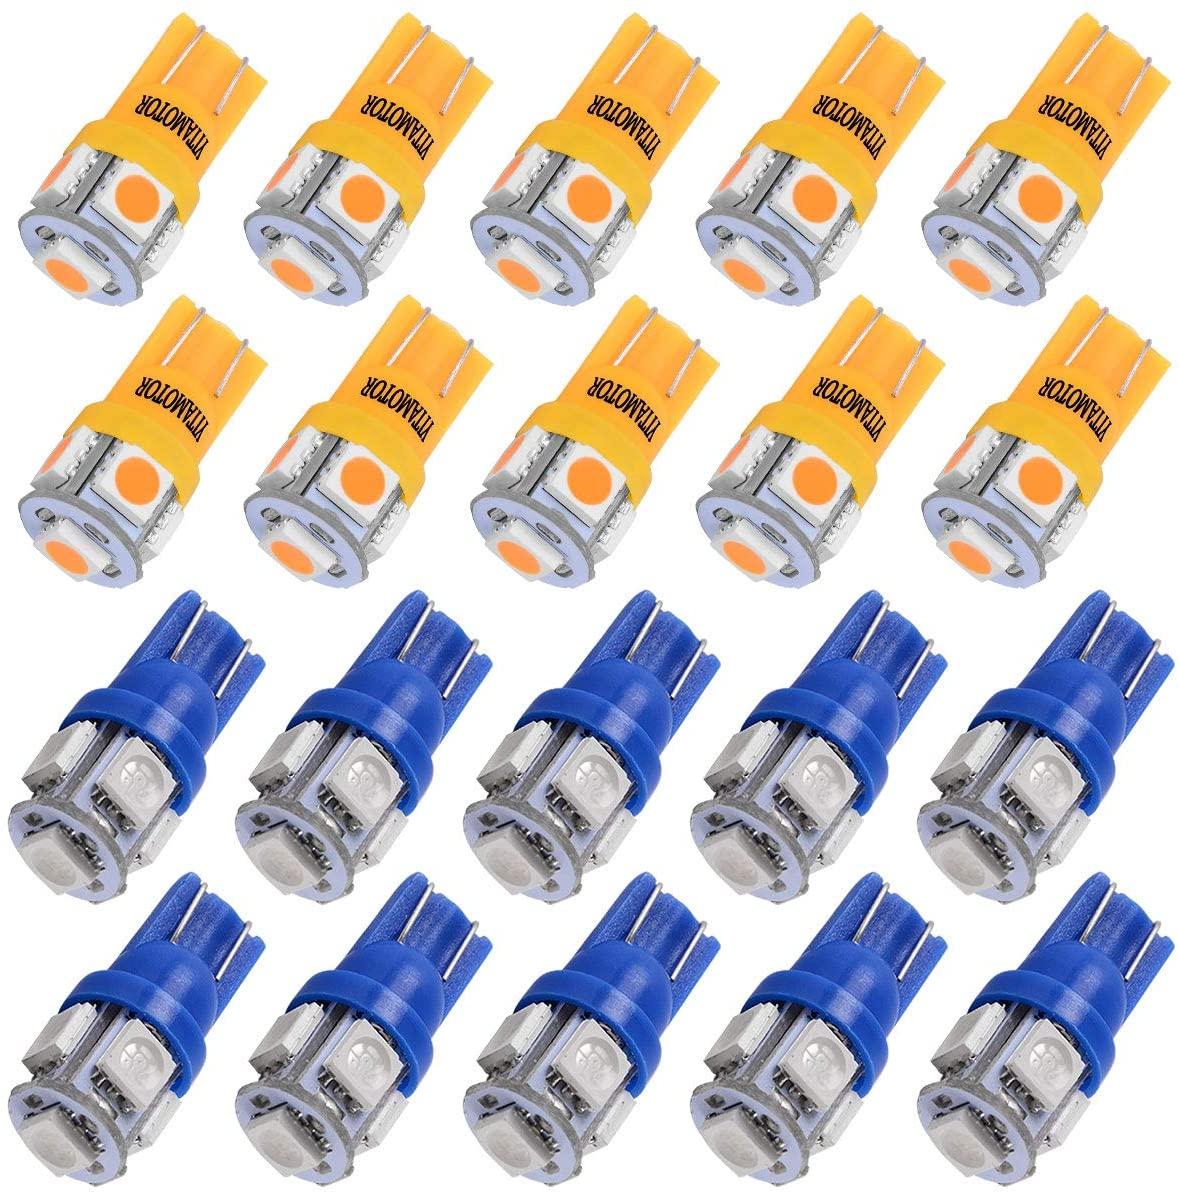 YITAMOTOR 10pcs Amber and 10pcs Blue T10 194 168 LED Bulbs for License Plate Lights, Dome Lights, Map Lights, 158 175 194NA 2825 161 LED Light Bulb, 12V DC